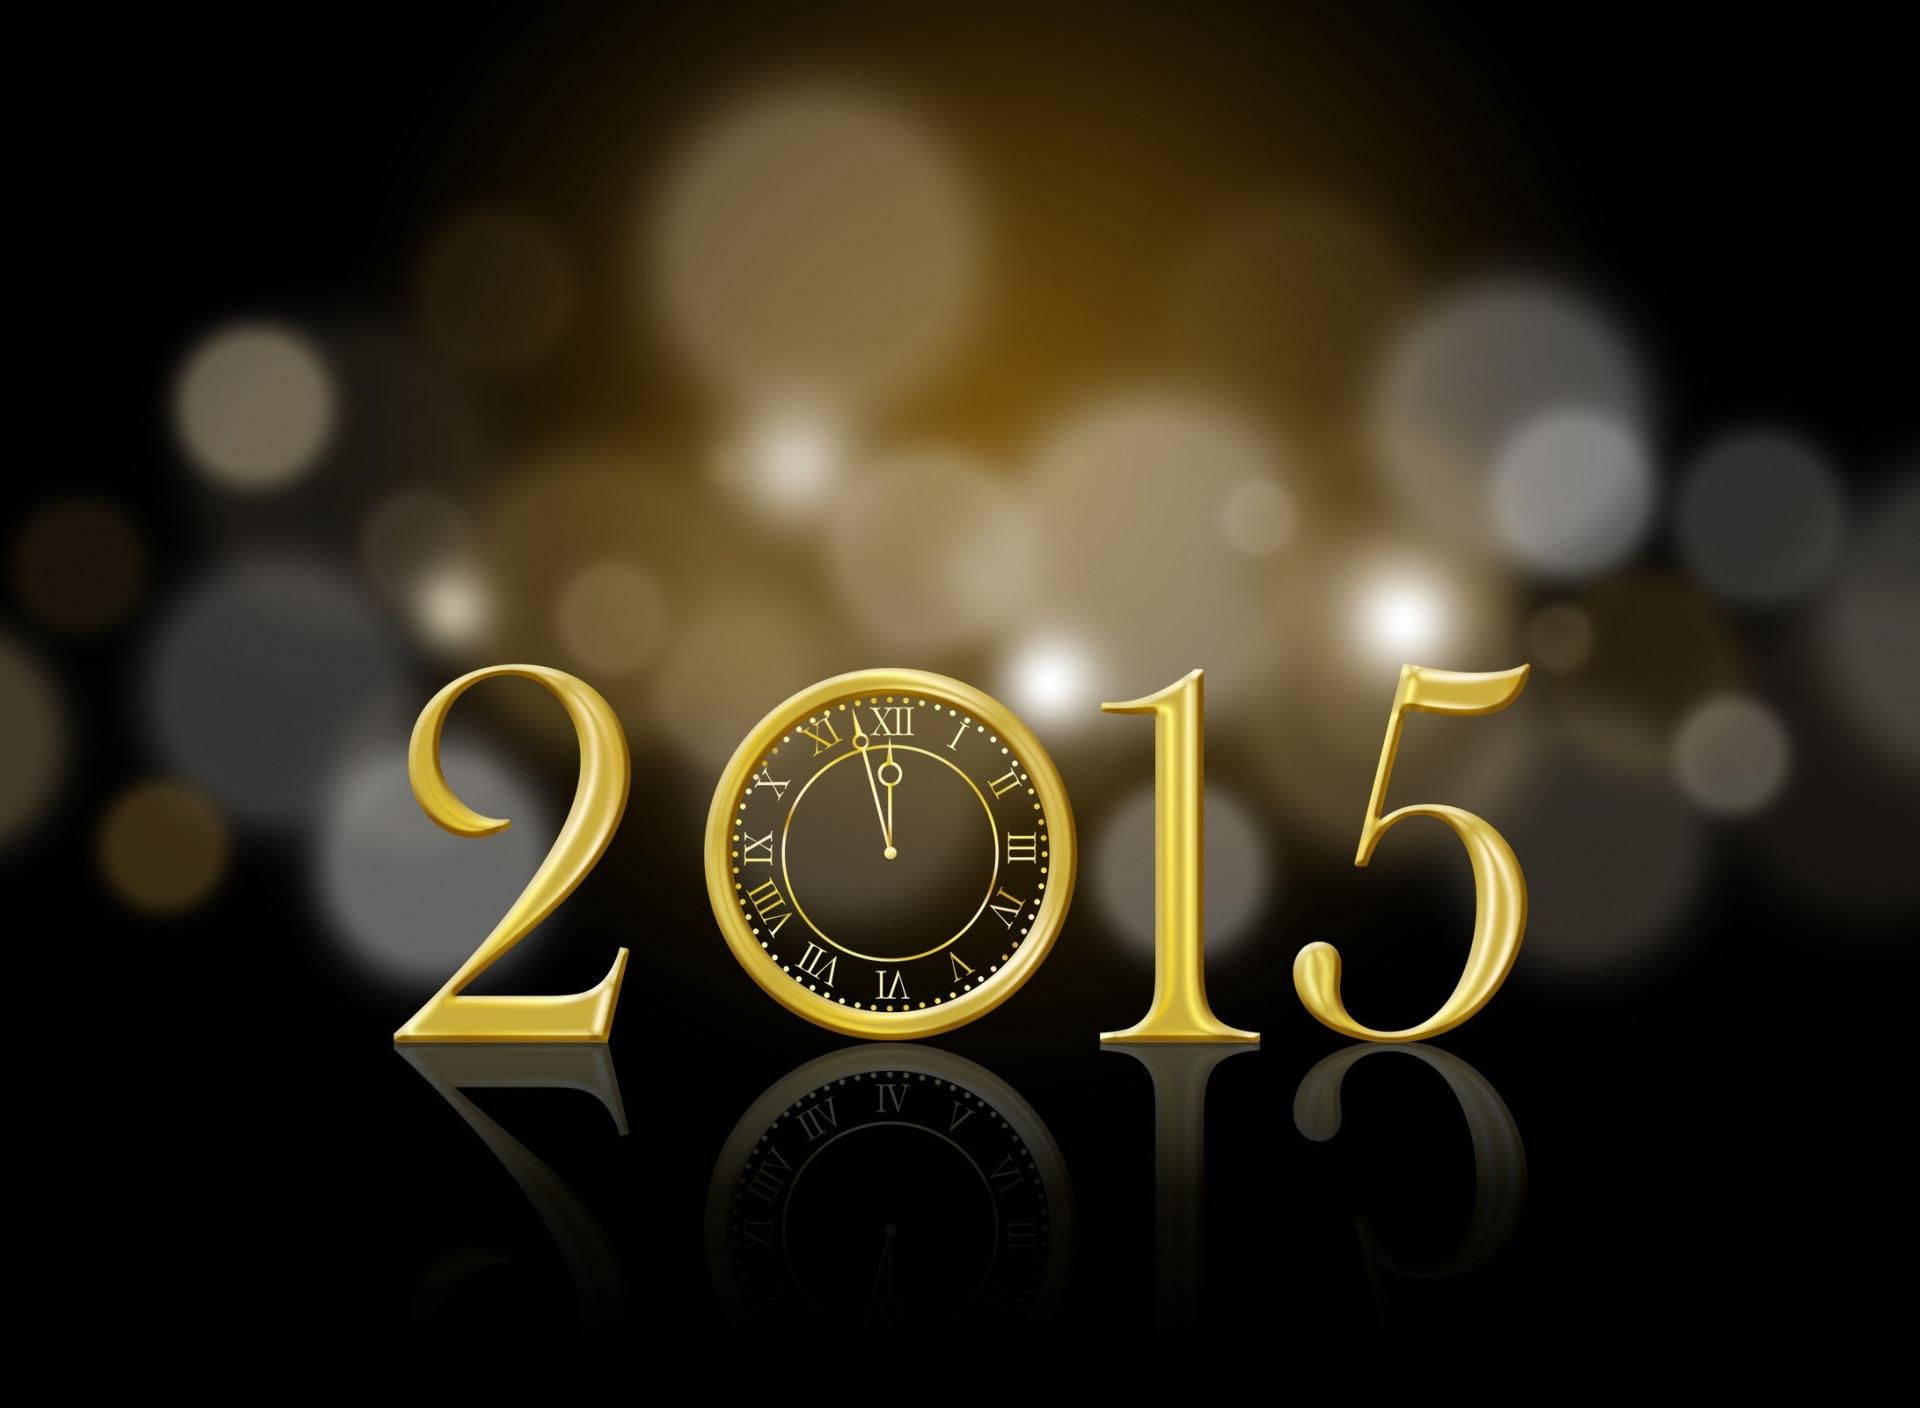 Картинки к 2015 году